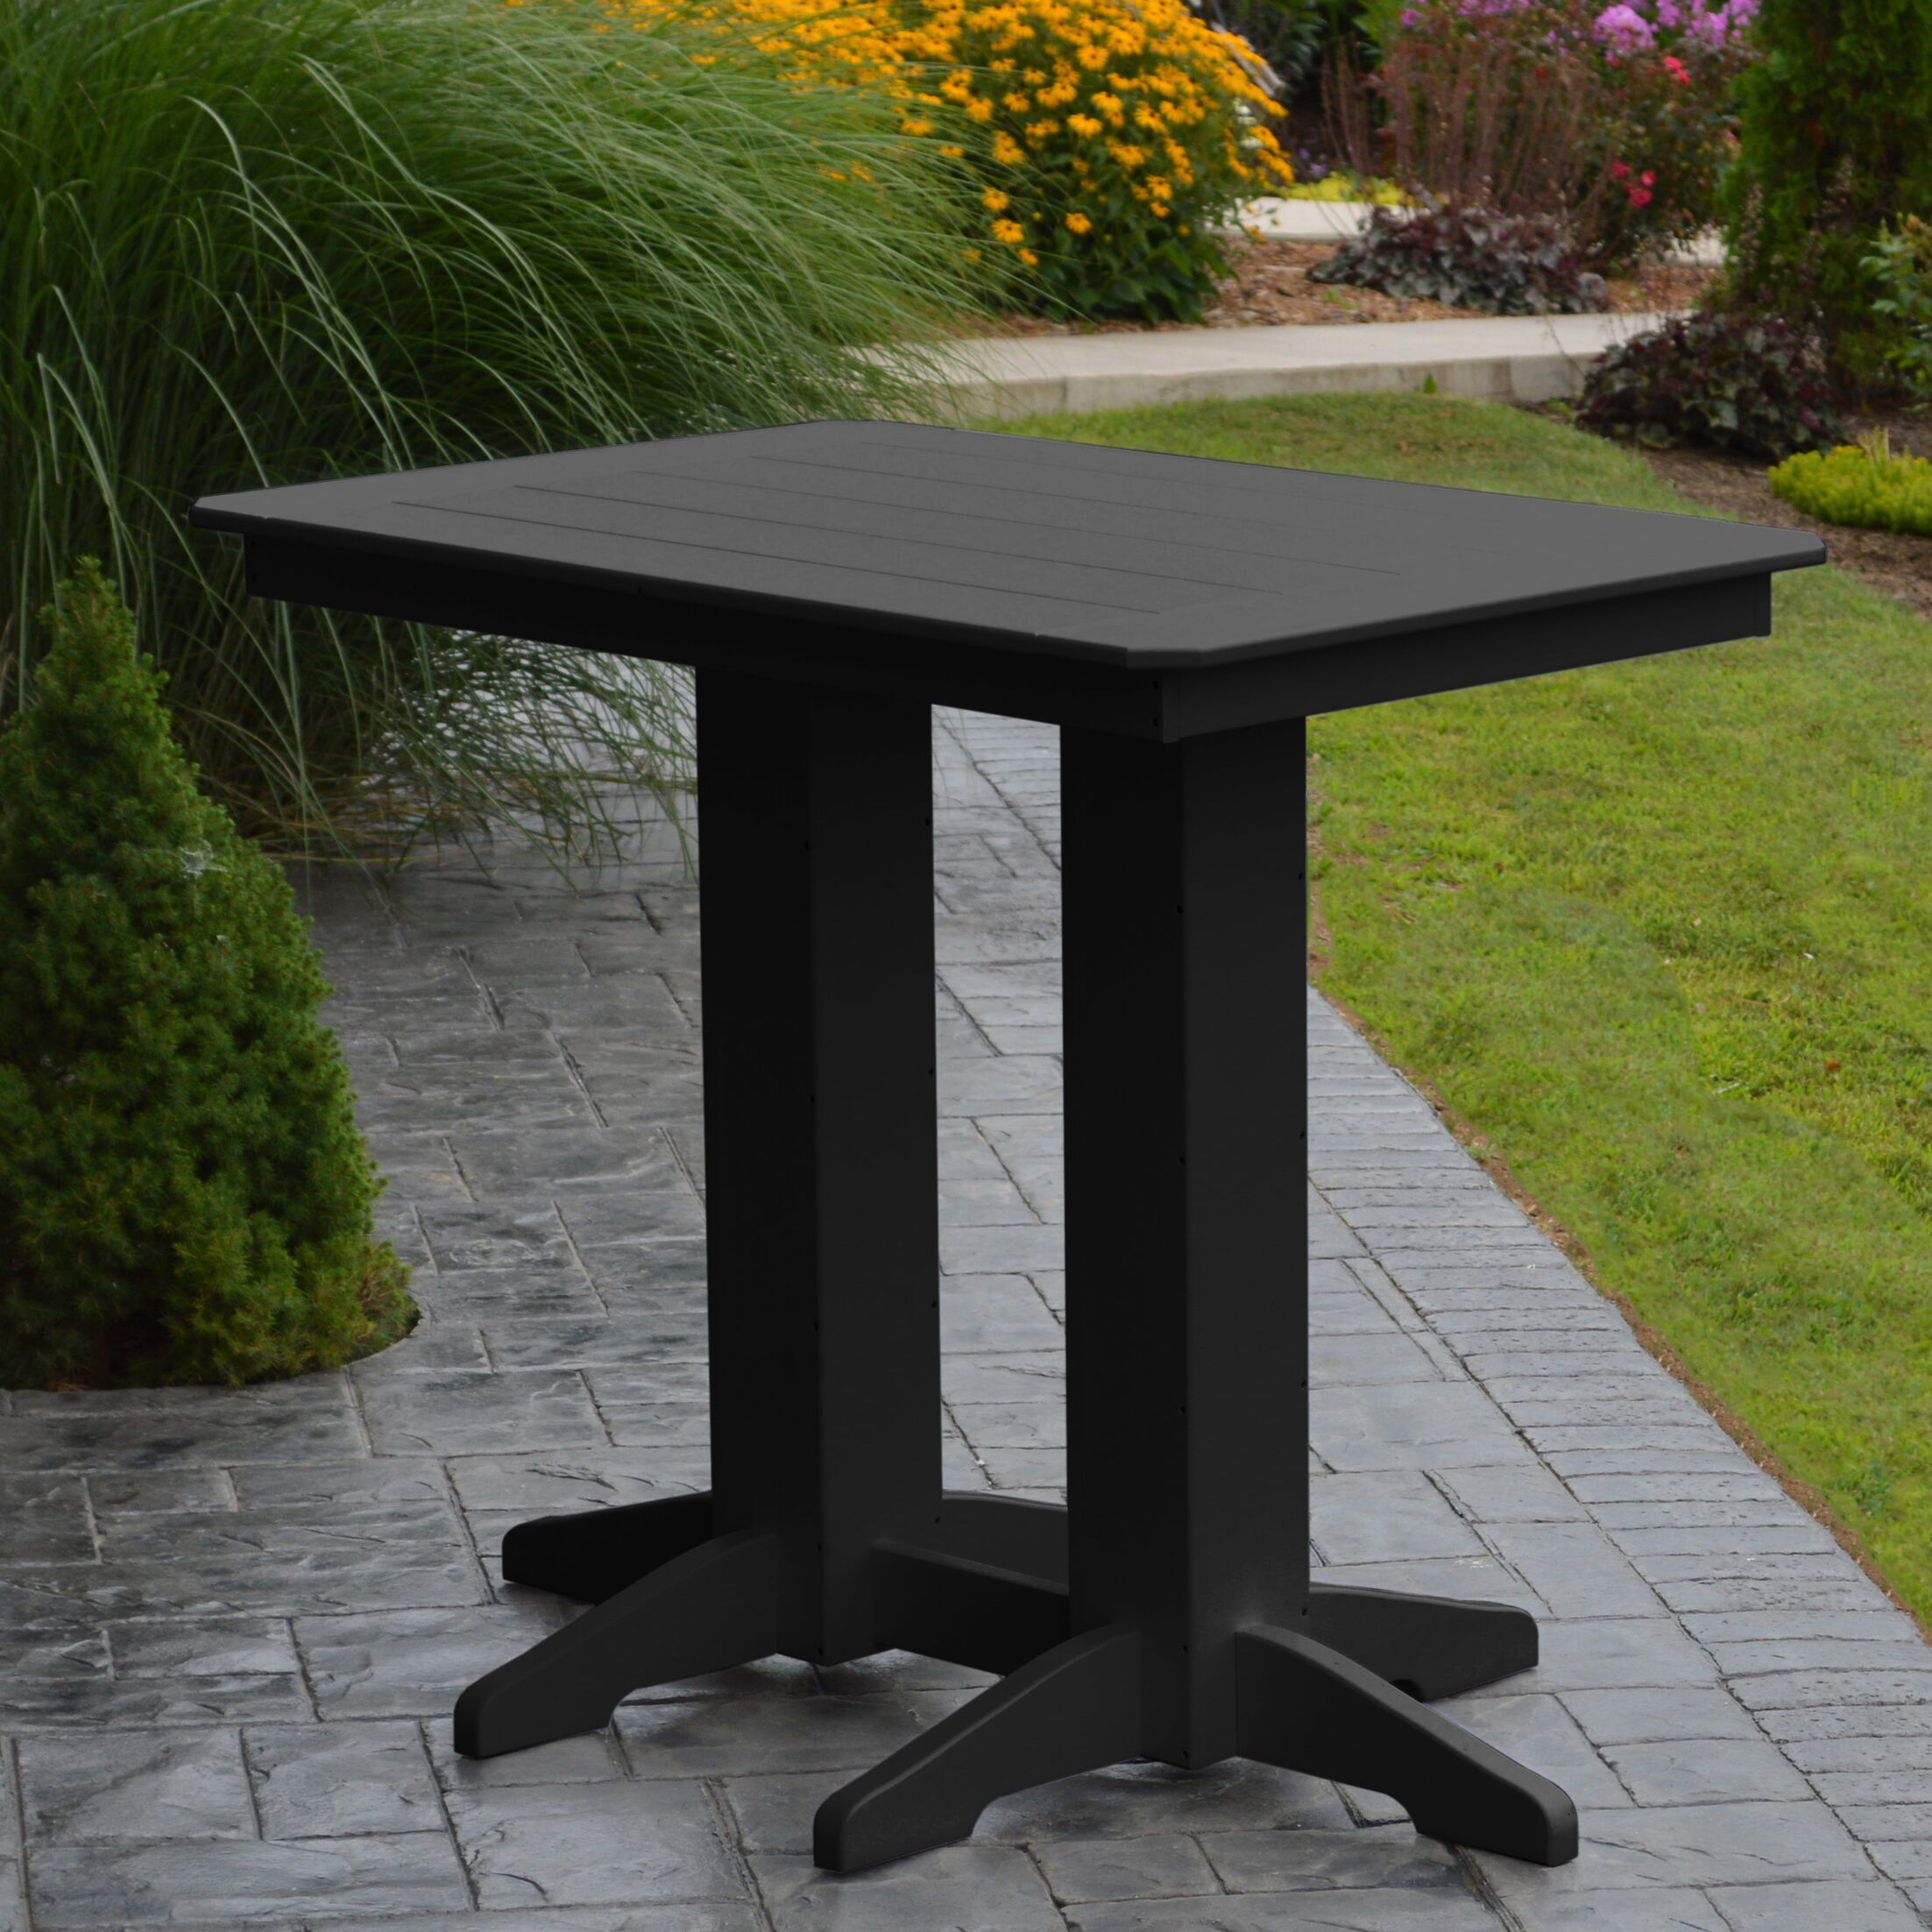 Nettie Bar Table Color: Black, Table Size: 48